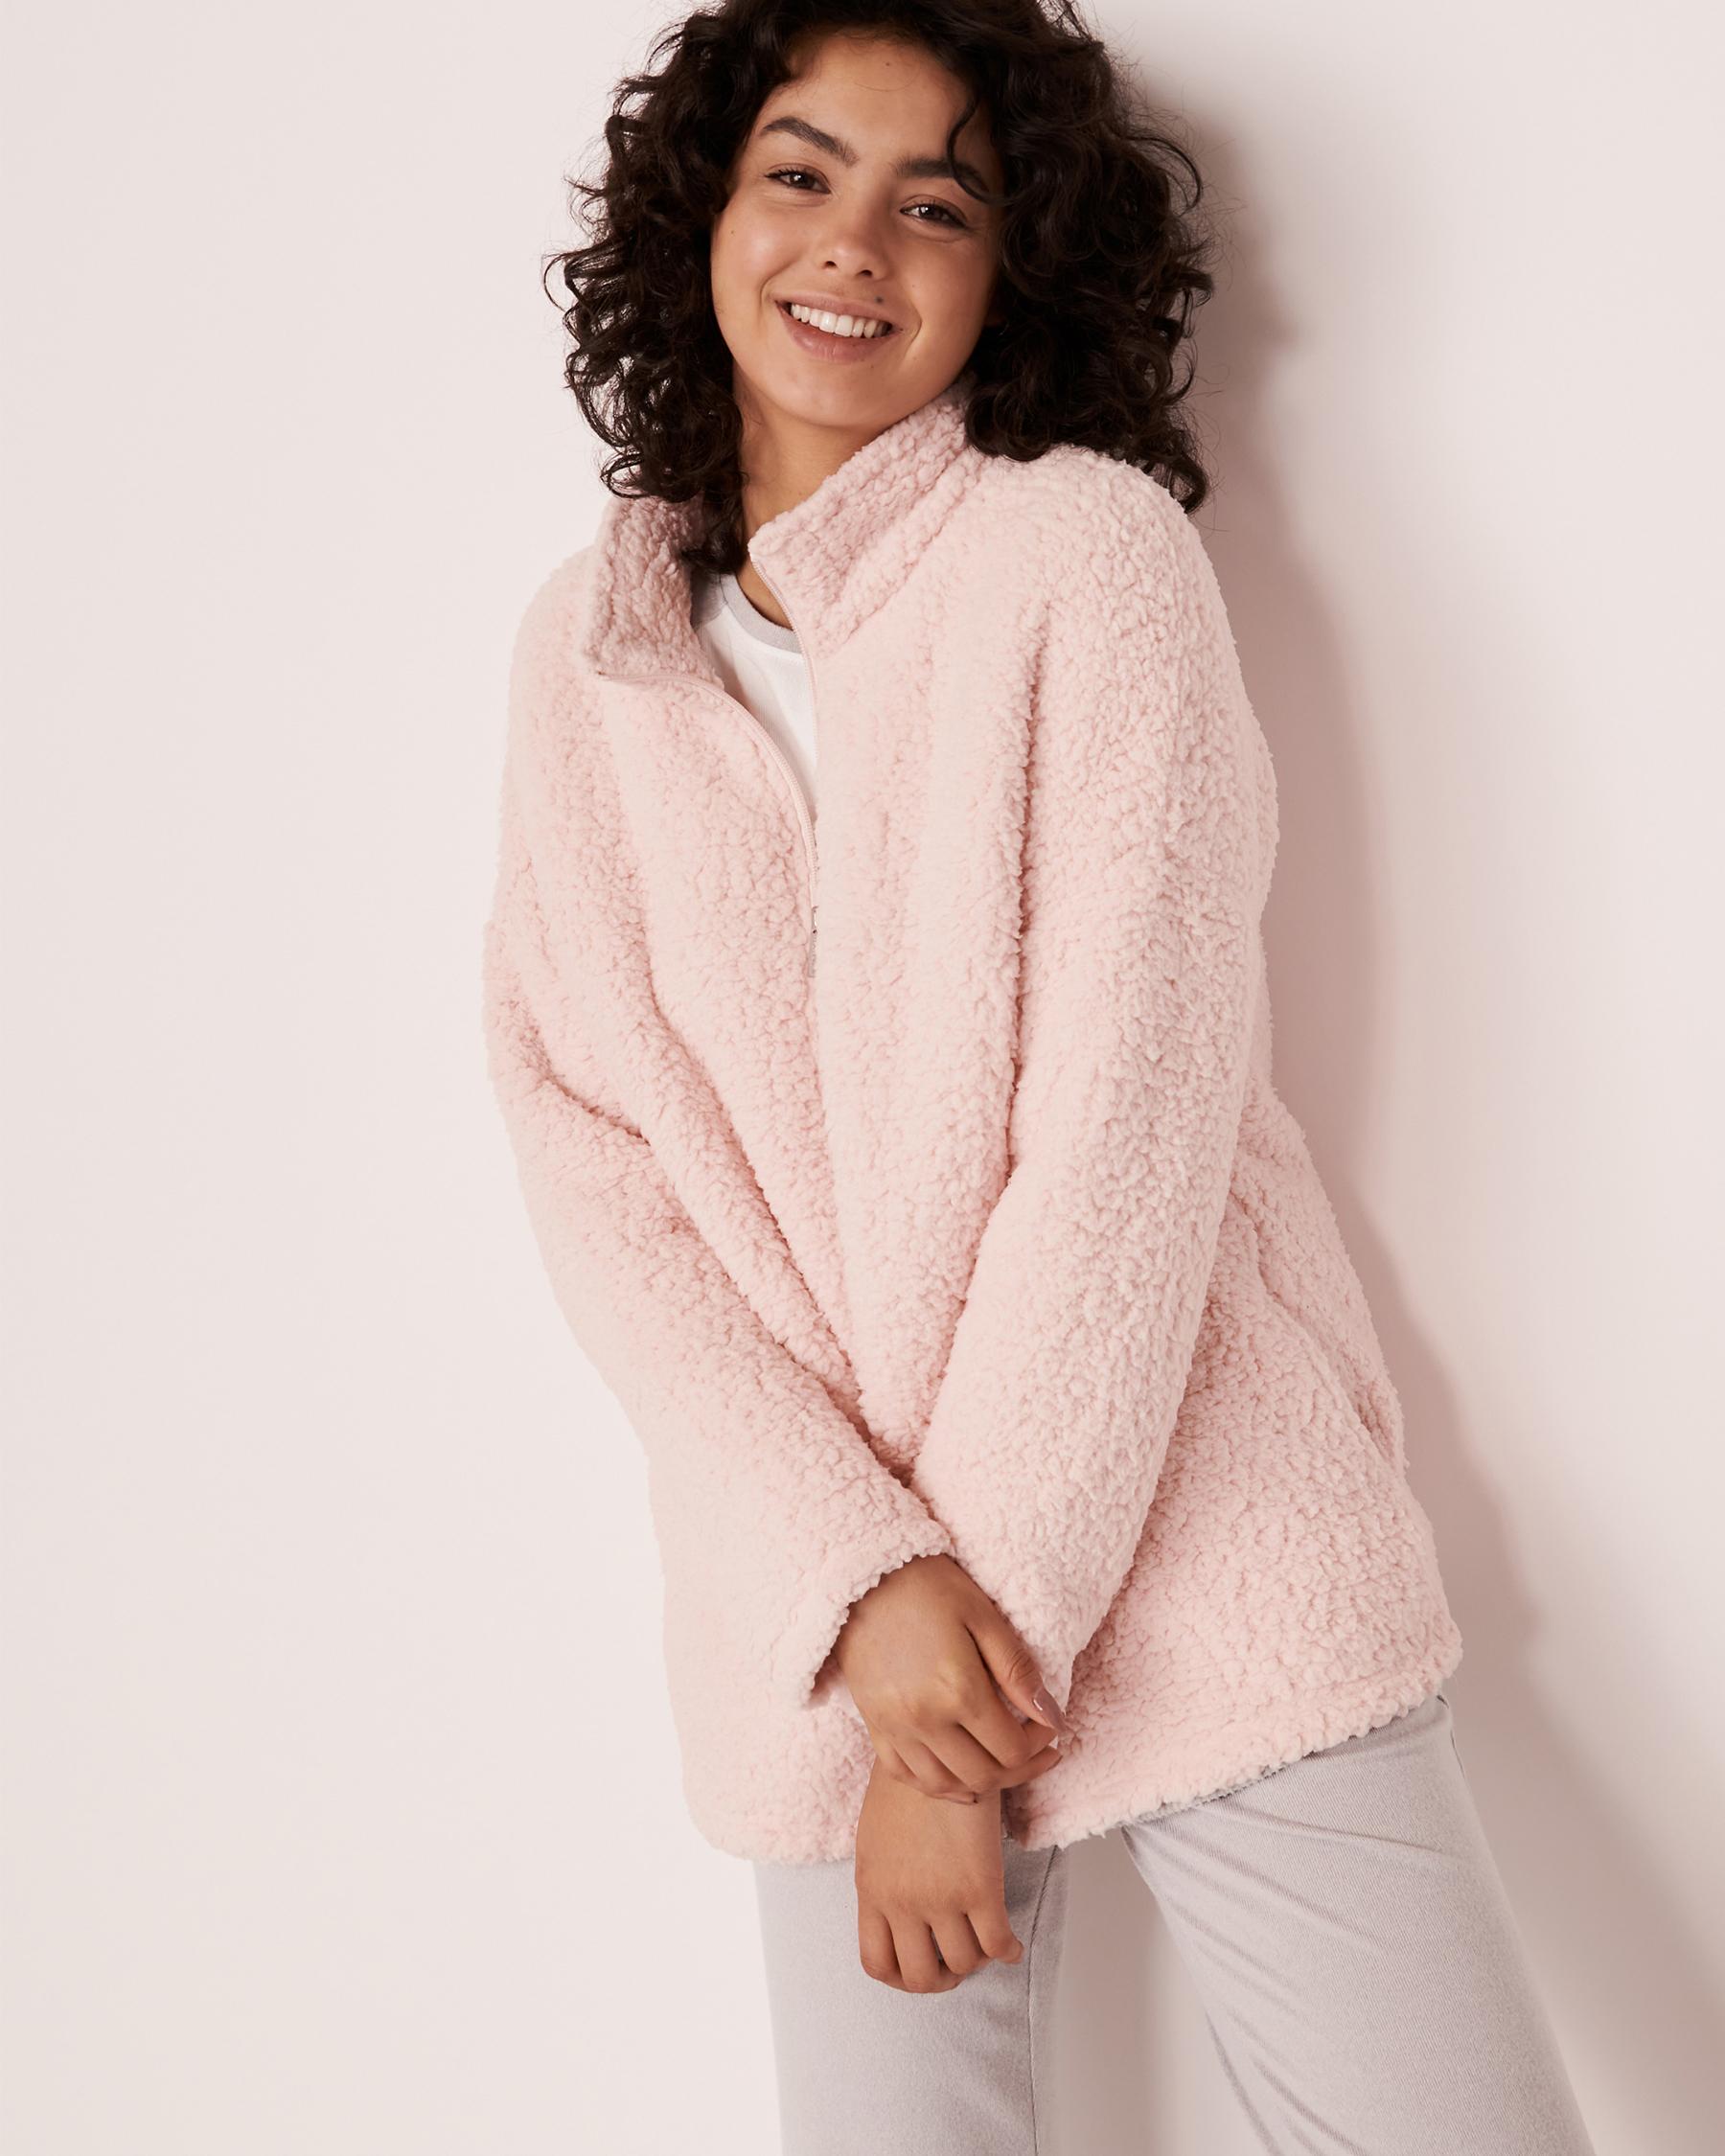 LA VIE EN ROSE Sherpa Zip-up Sweatshirt Light pink 40600038 - View3